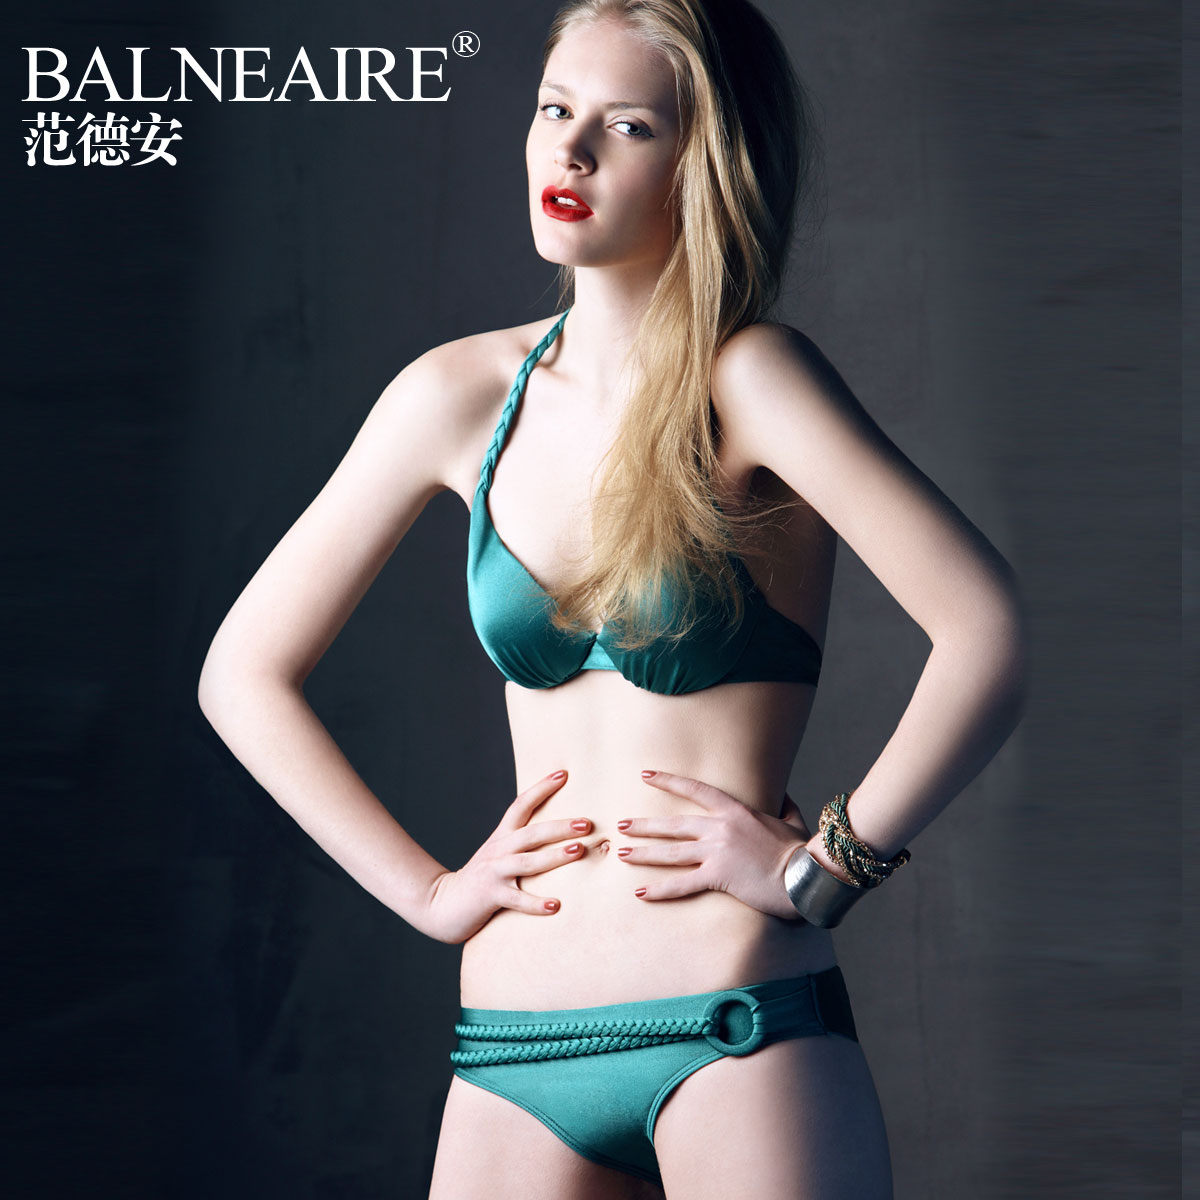 купальник Balneaire 80668 2013 Bikini Нейлон, Спандекс Лиф с косточками Треугольник бикини